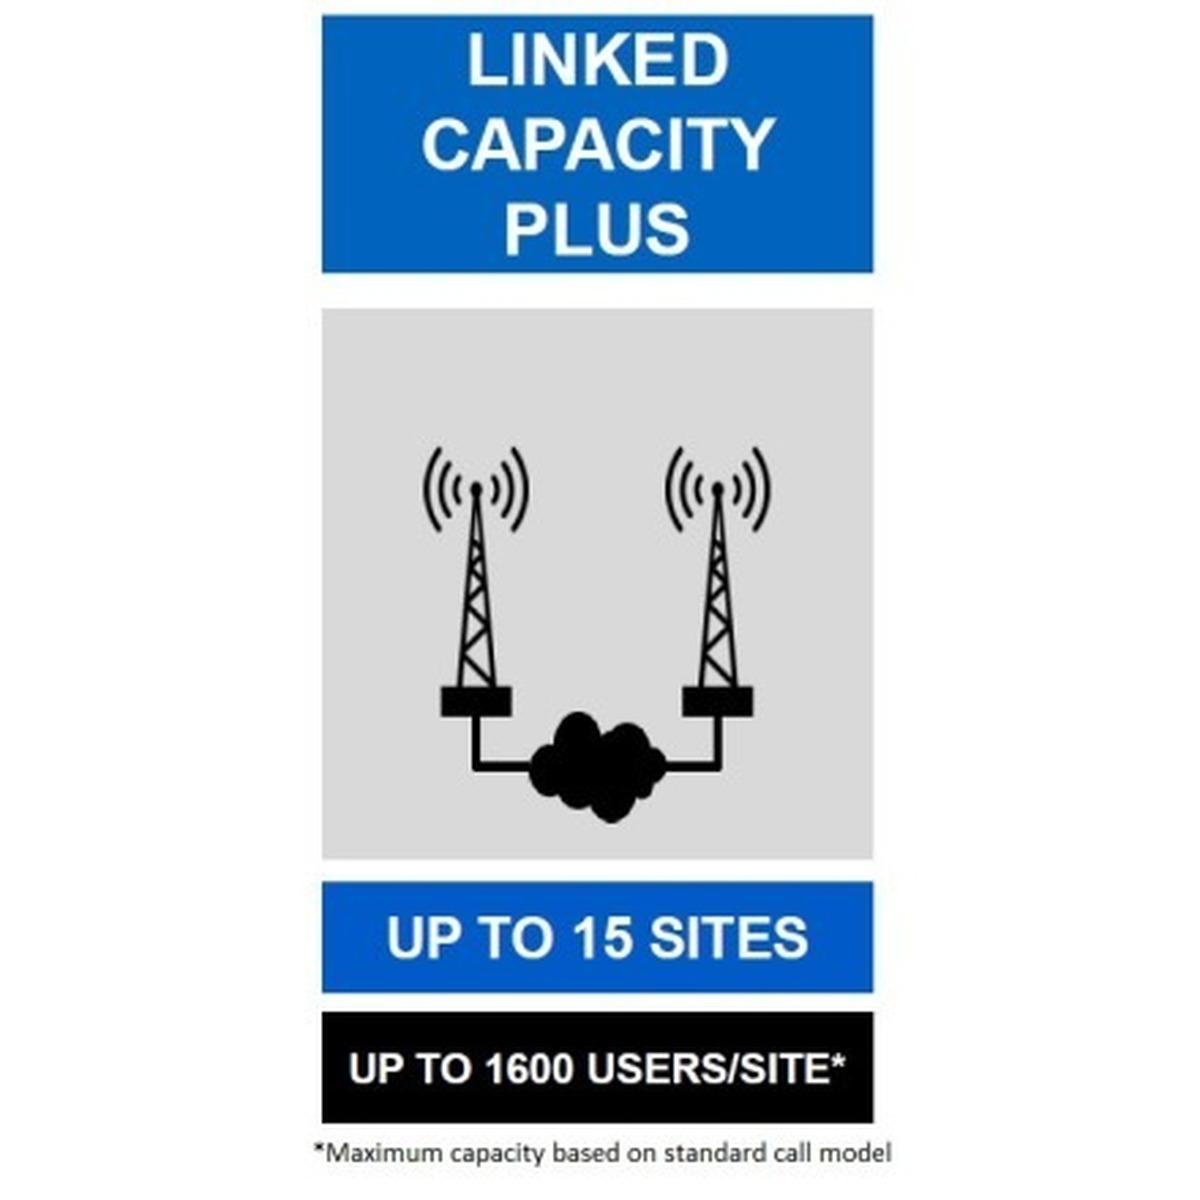 Licencia Motorola Linked Capacity Plus Multi-Site HKVN4092 para Portátil